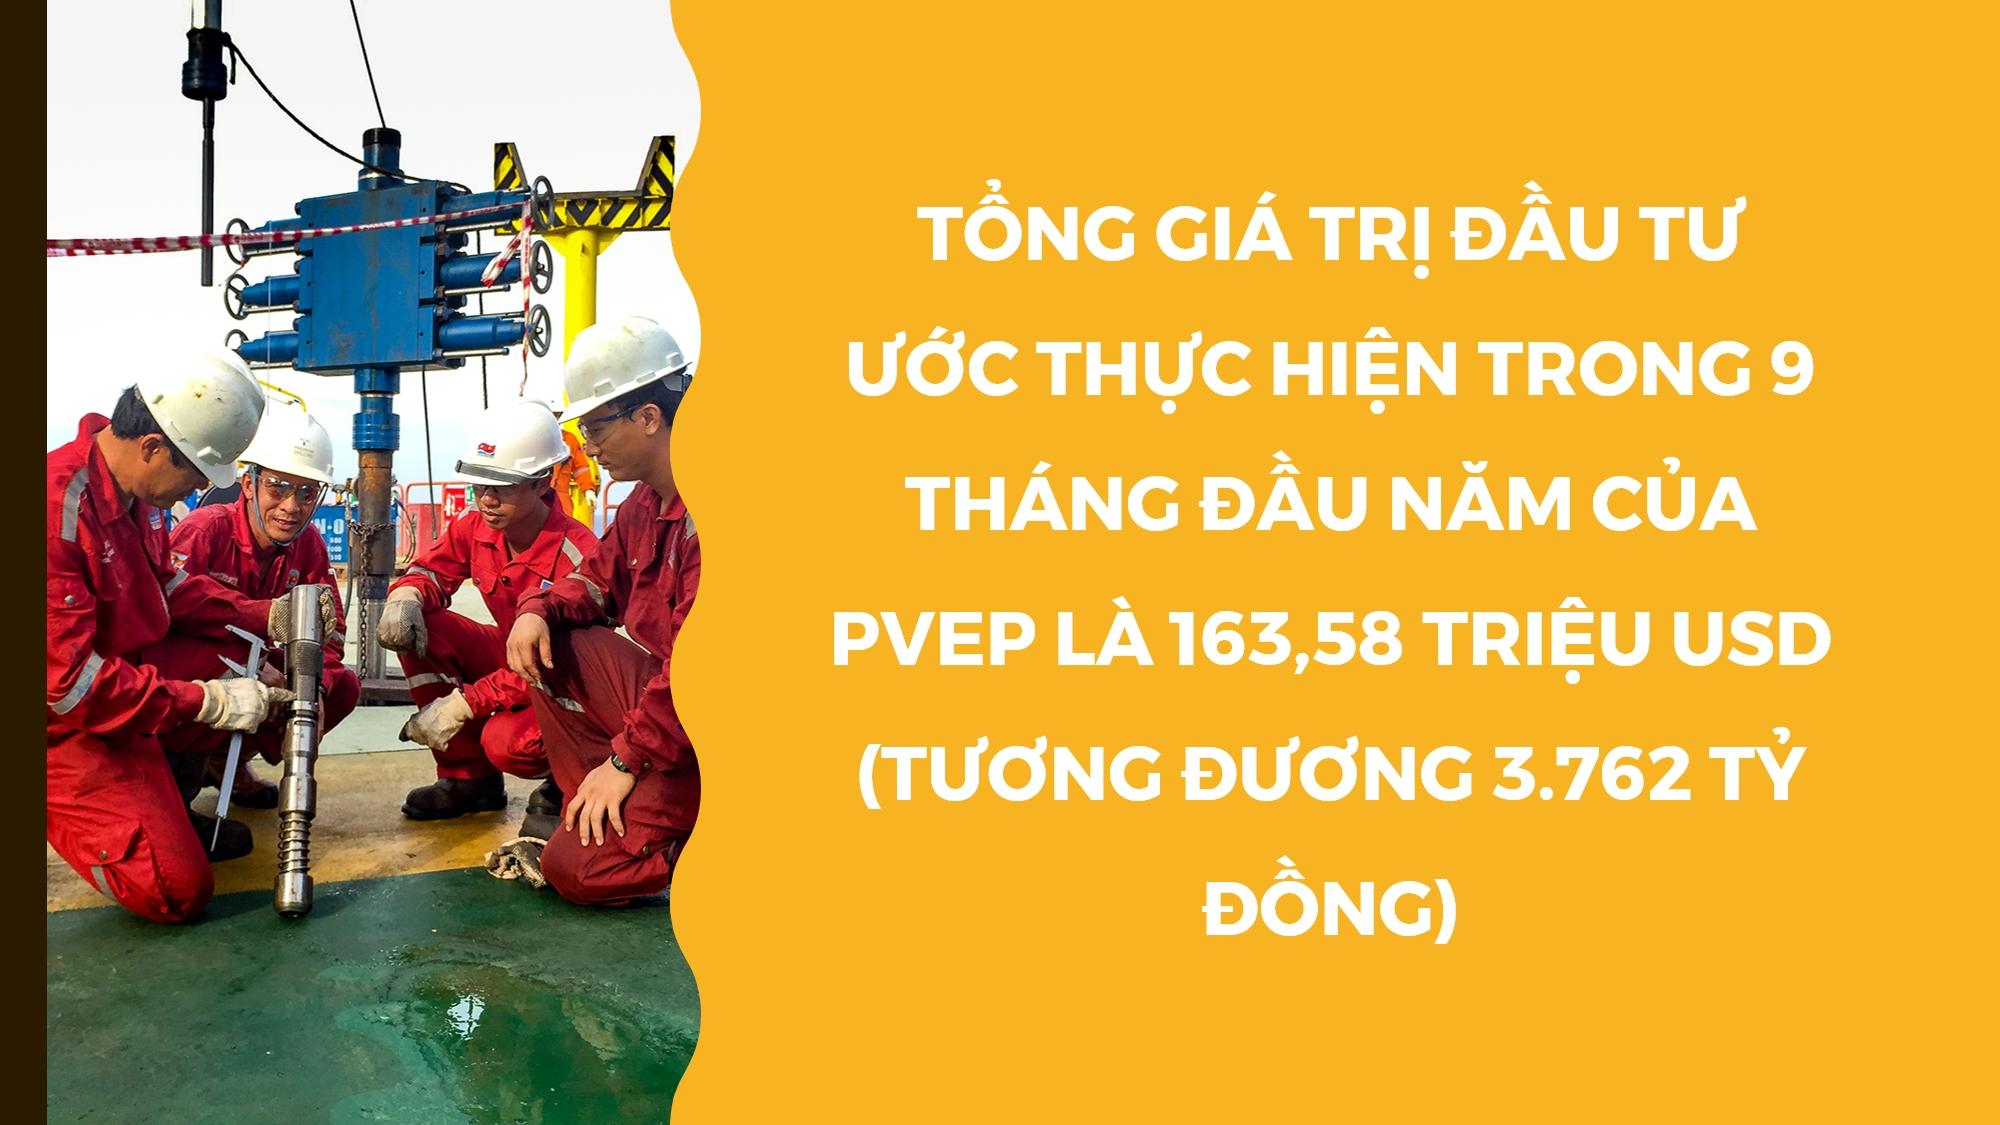 e magazine pvep hoan thanh nhieu muc tieu tai chinh ca nam 2018